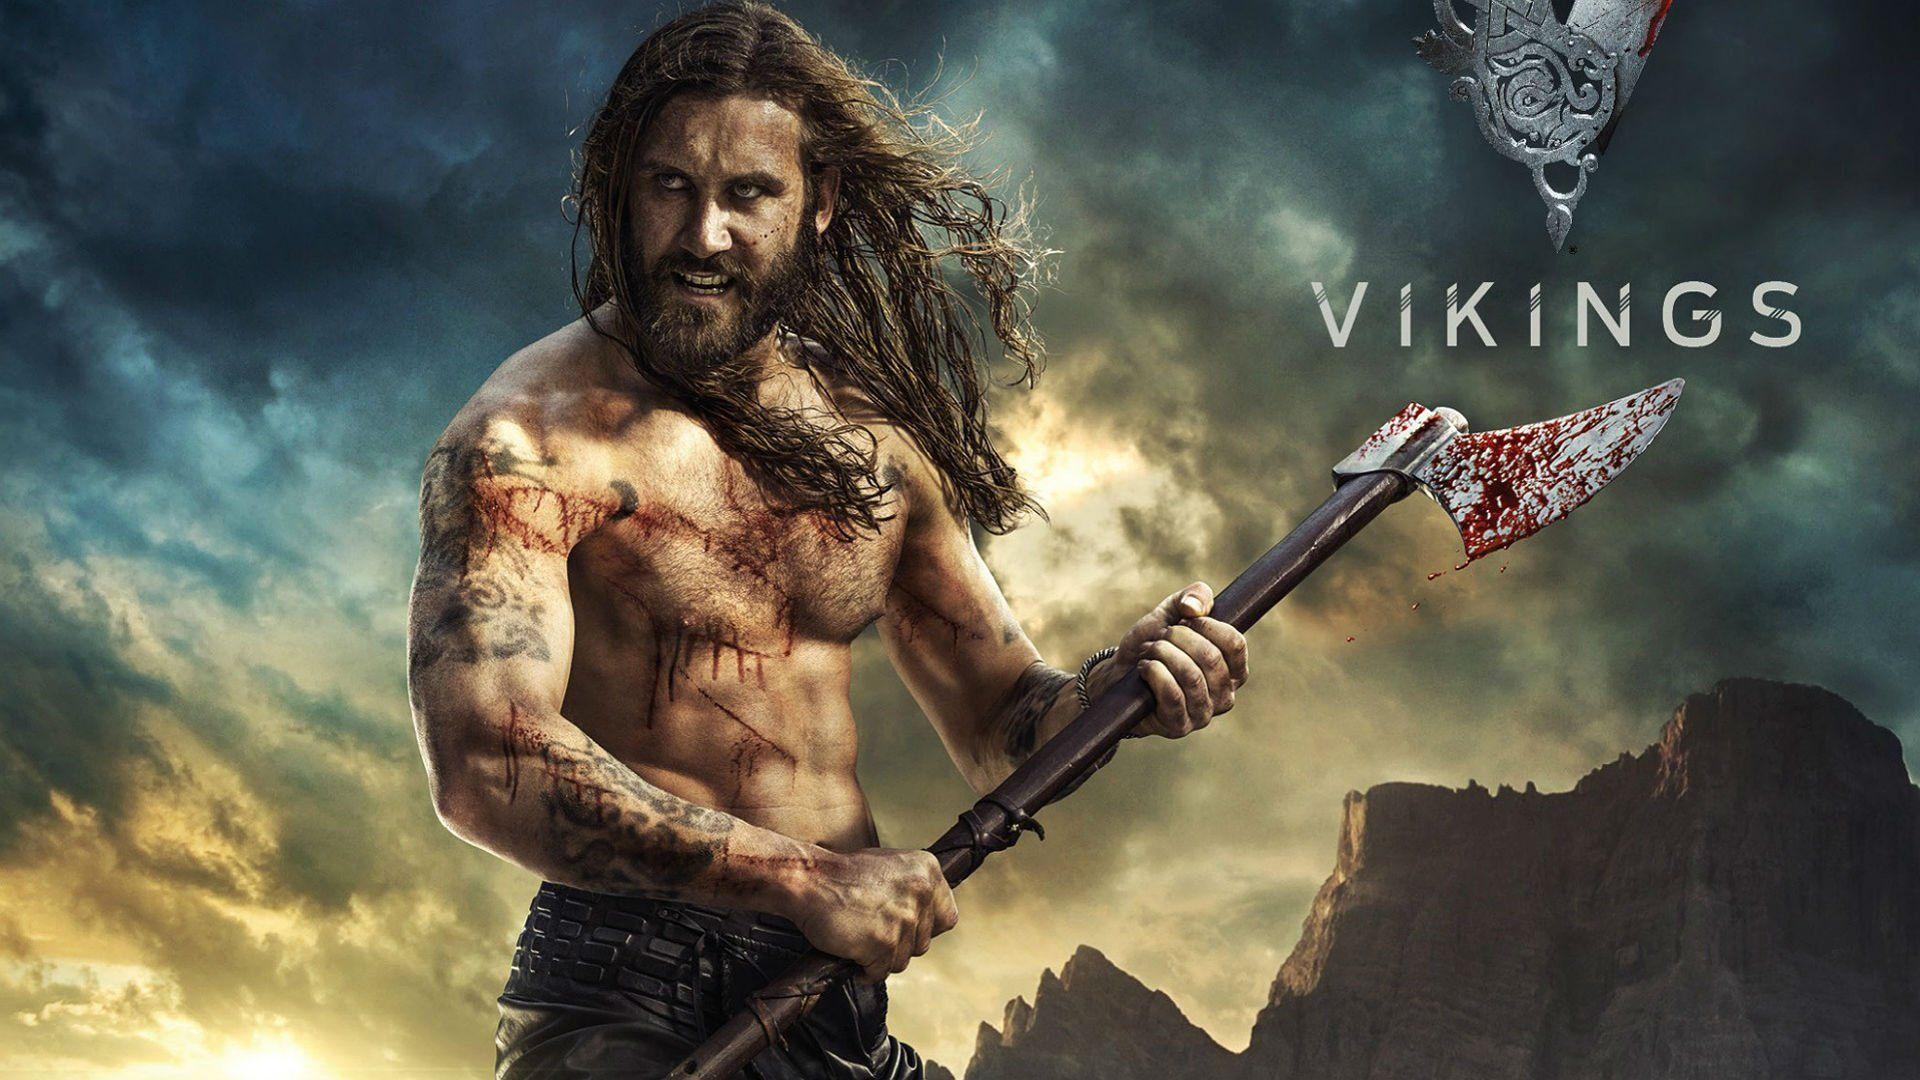 Viking Warrior Wallpaper With Images Vikings Tv Series Viking